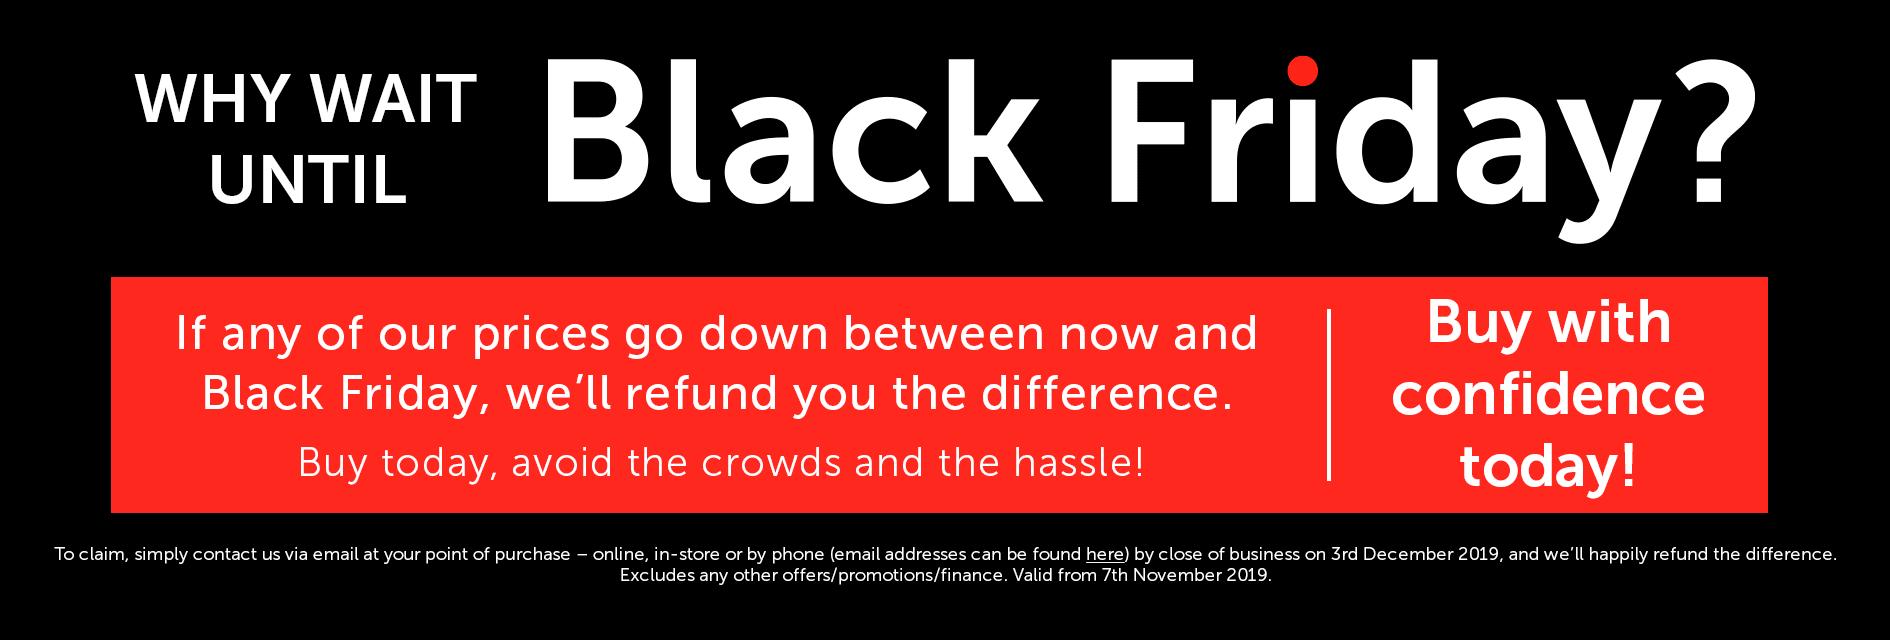 Why wait until Black Friday?